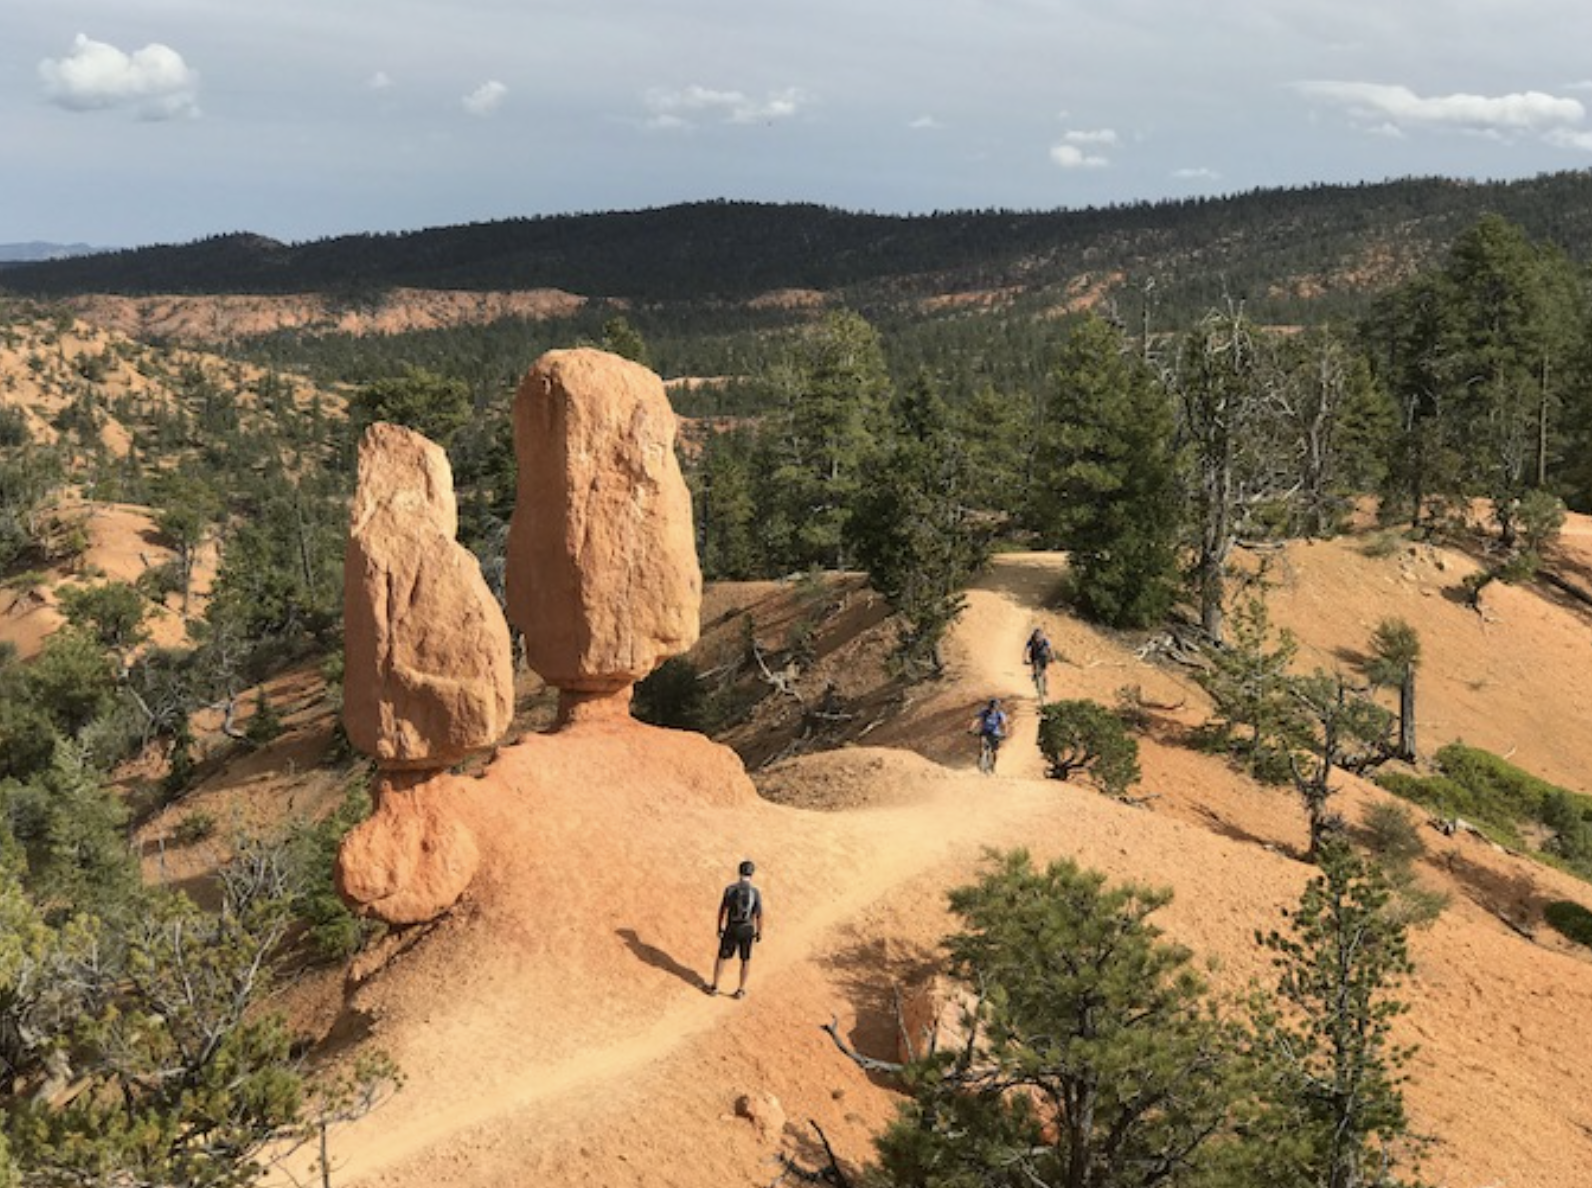 Biking among the rock formations of Utah